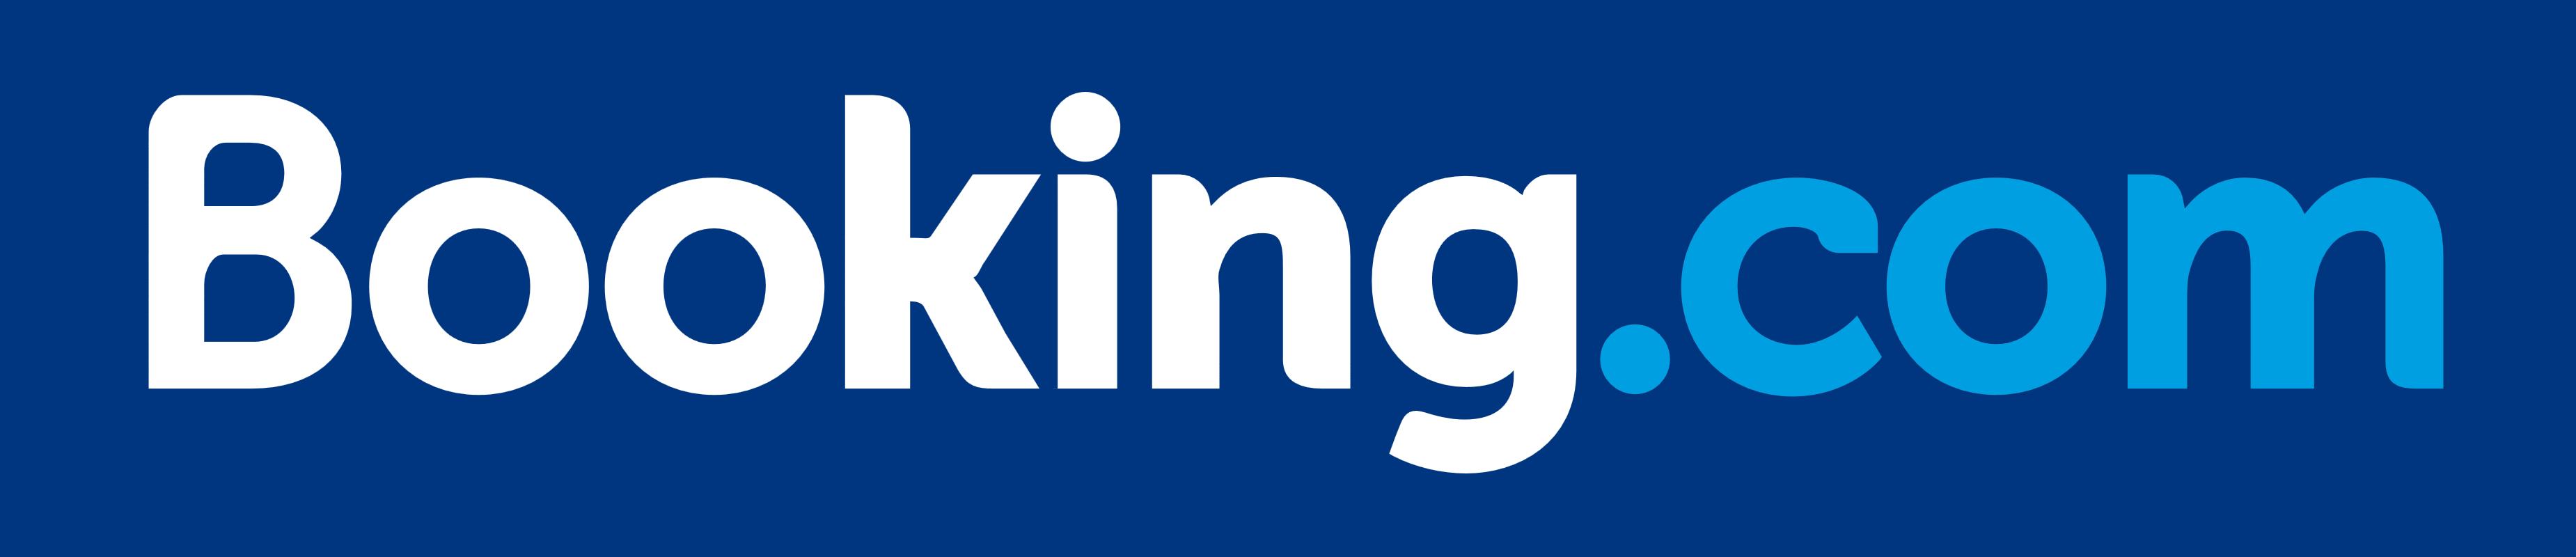 logo@2x_